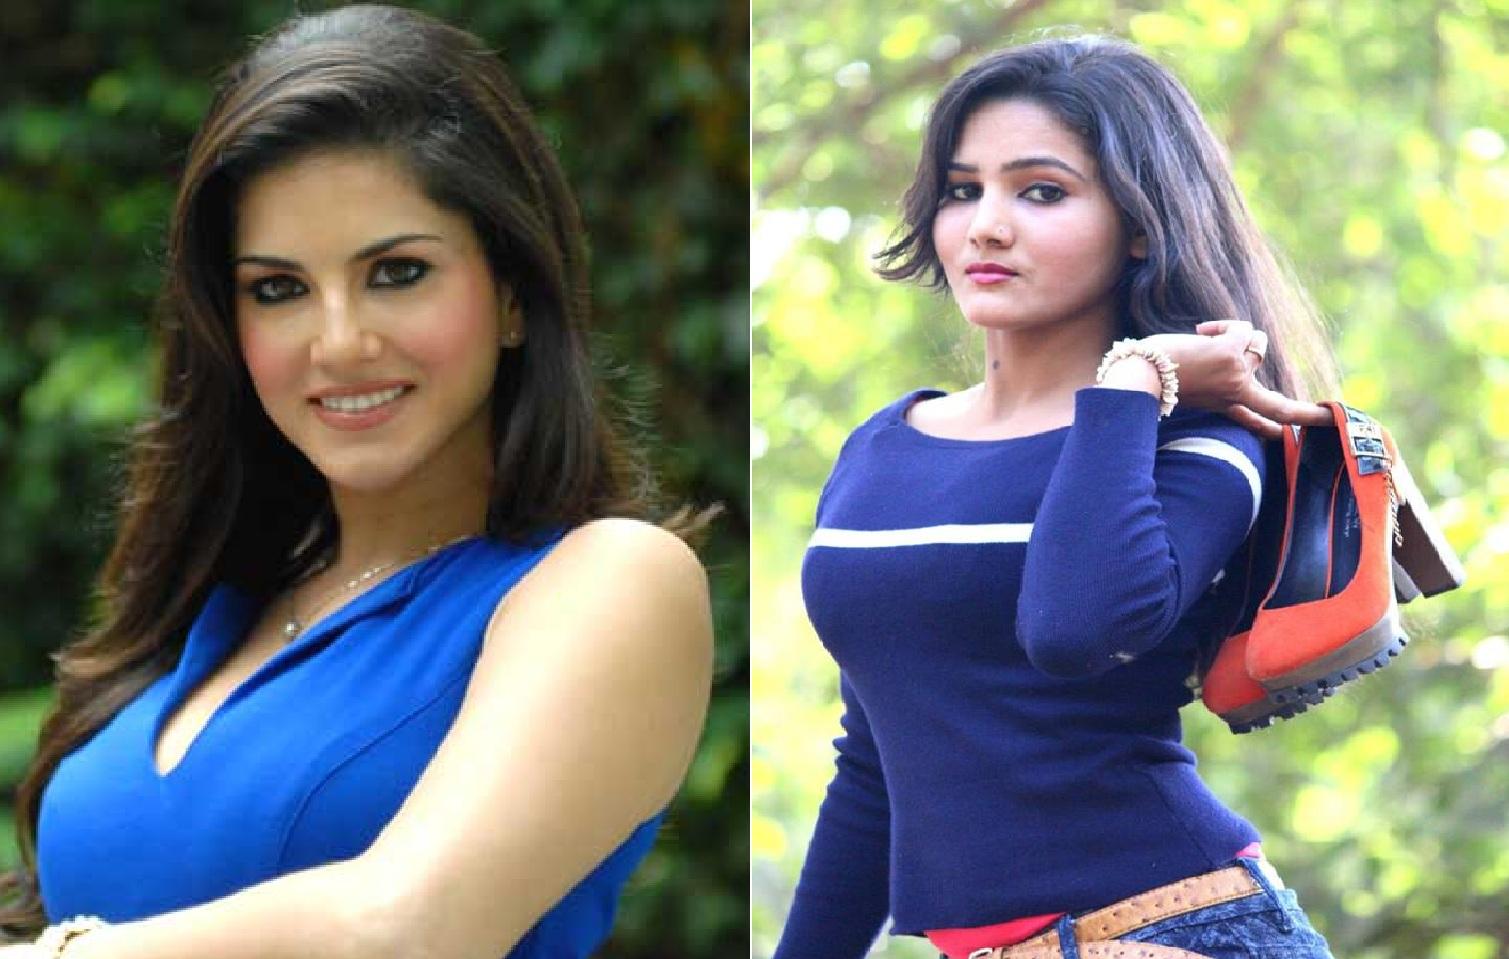 pallavi singh bhojpuri actress like sunny leone